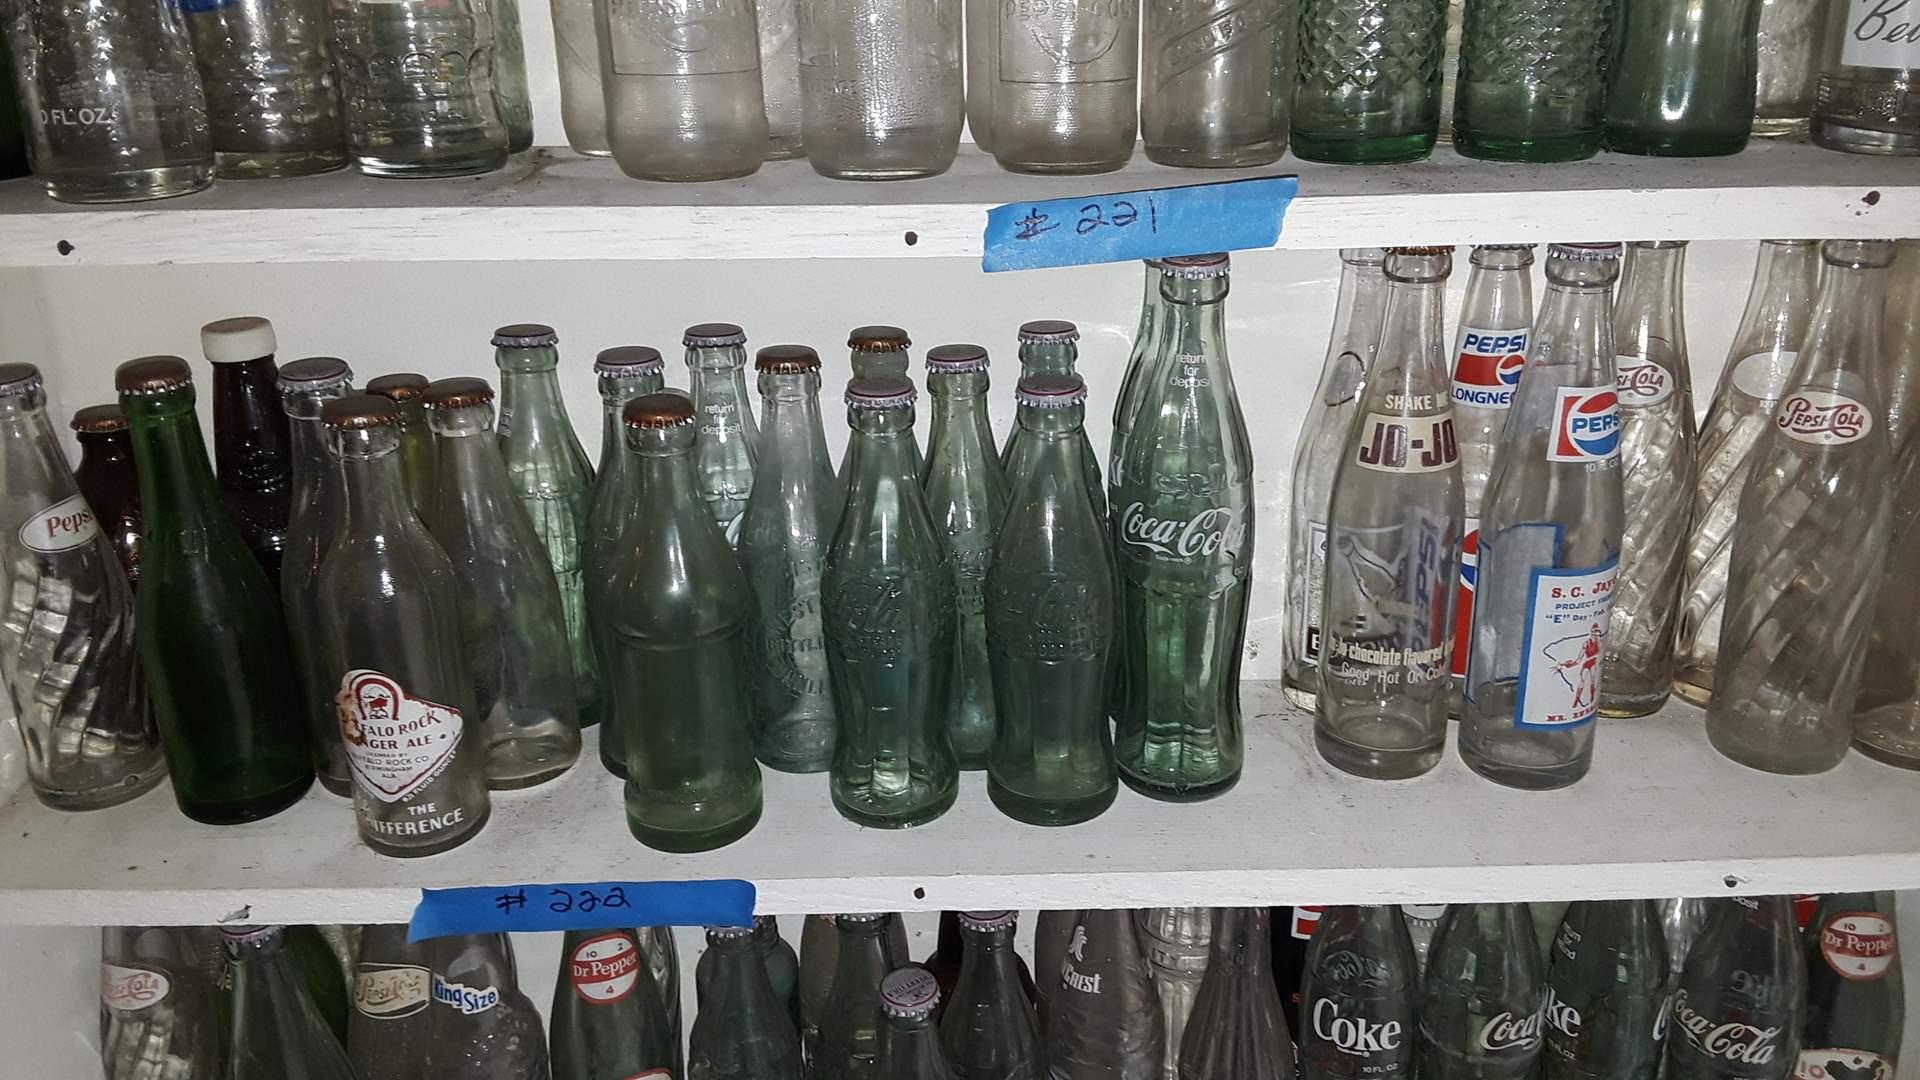 Lot # 222 COLLECTIBLE SODA BOTTLES, JO JO, COKE, PEPSI